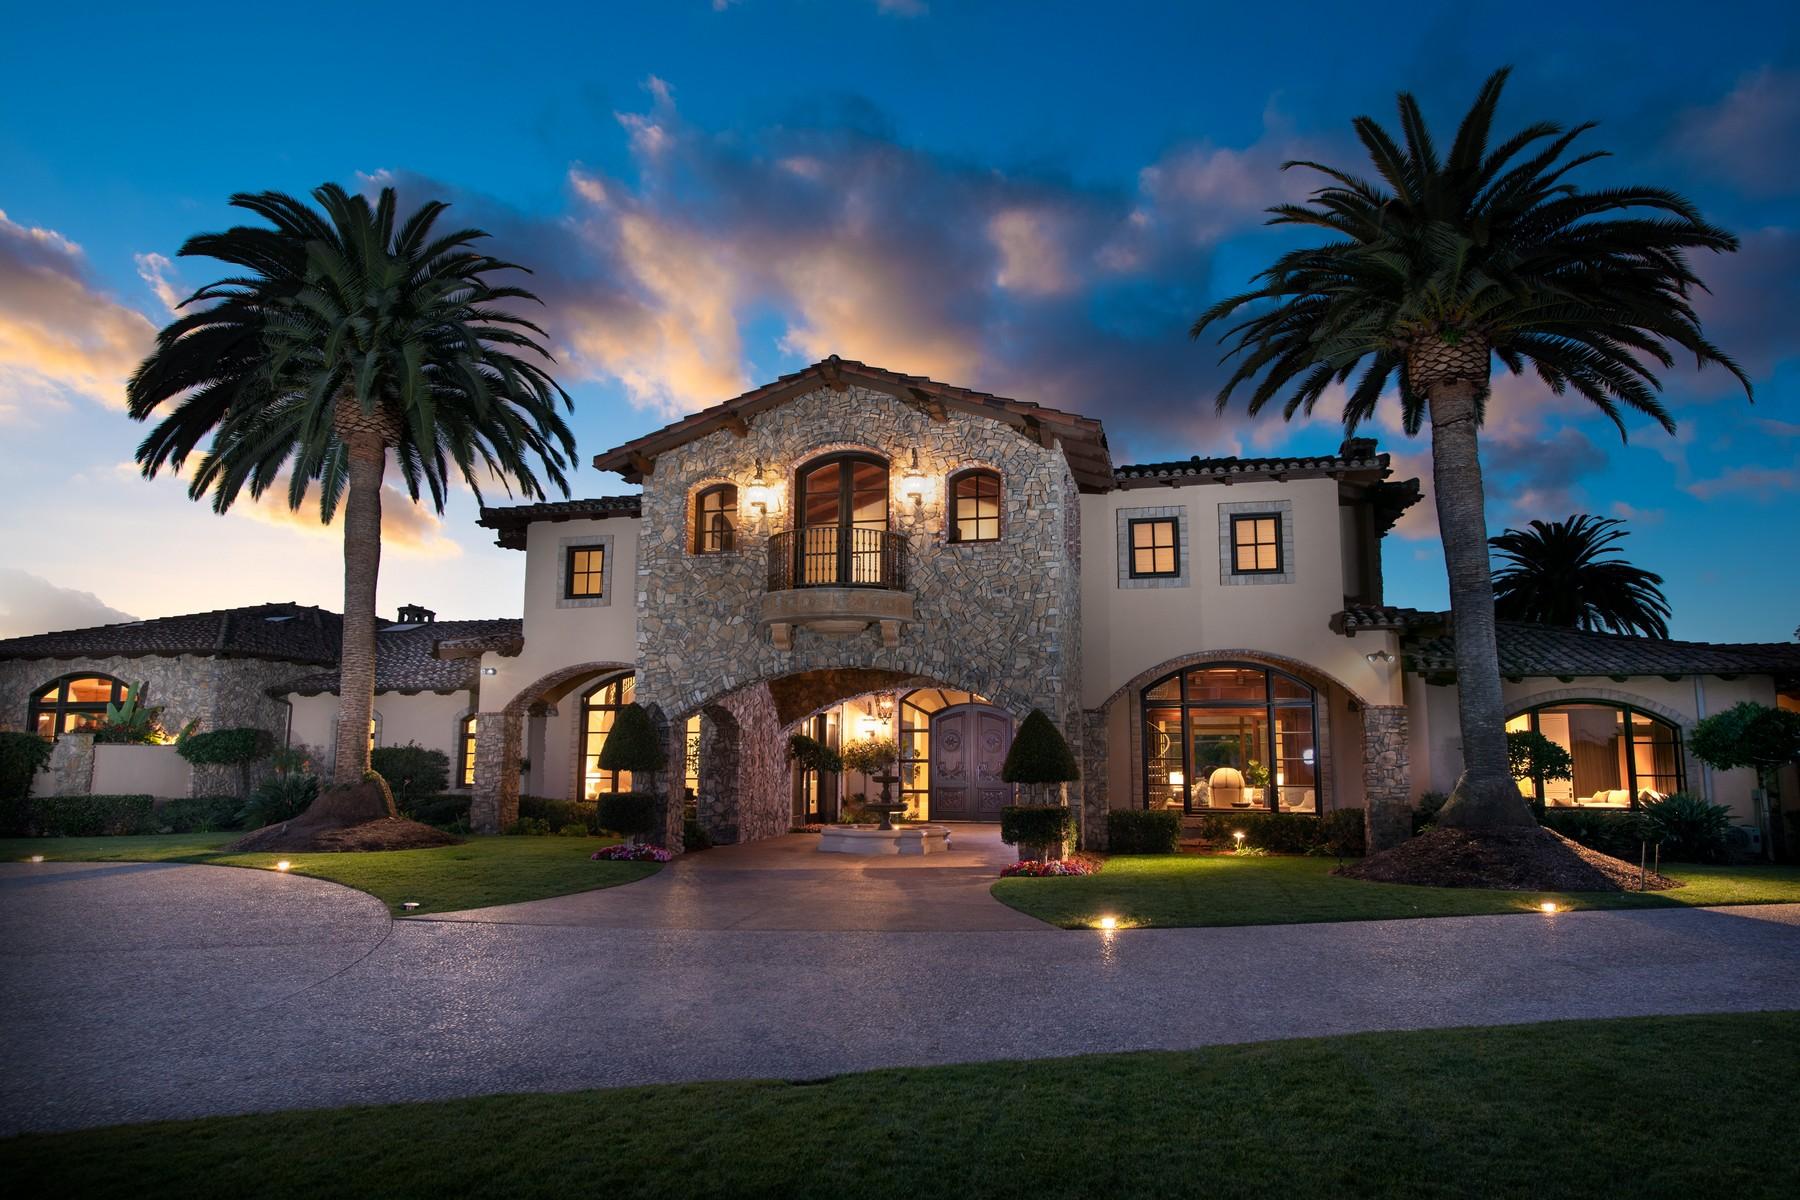 Single Family Homes for Sale at AWE INSPIRING MASTERPIECE 6306 El Apajo Rancho Santa Fe, California 92067 United States